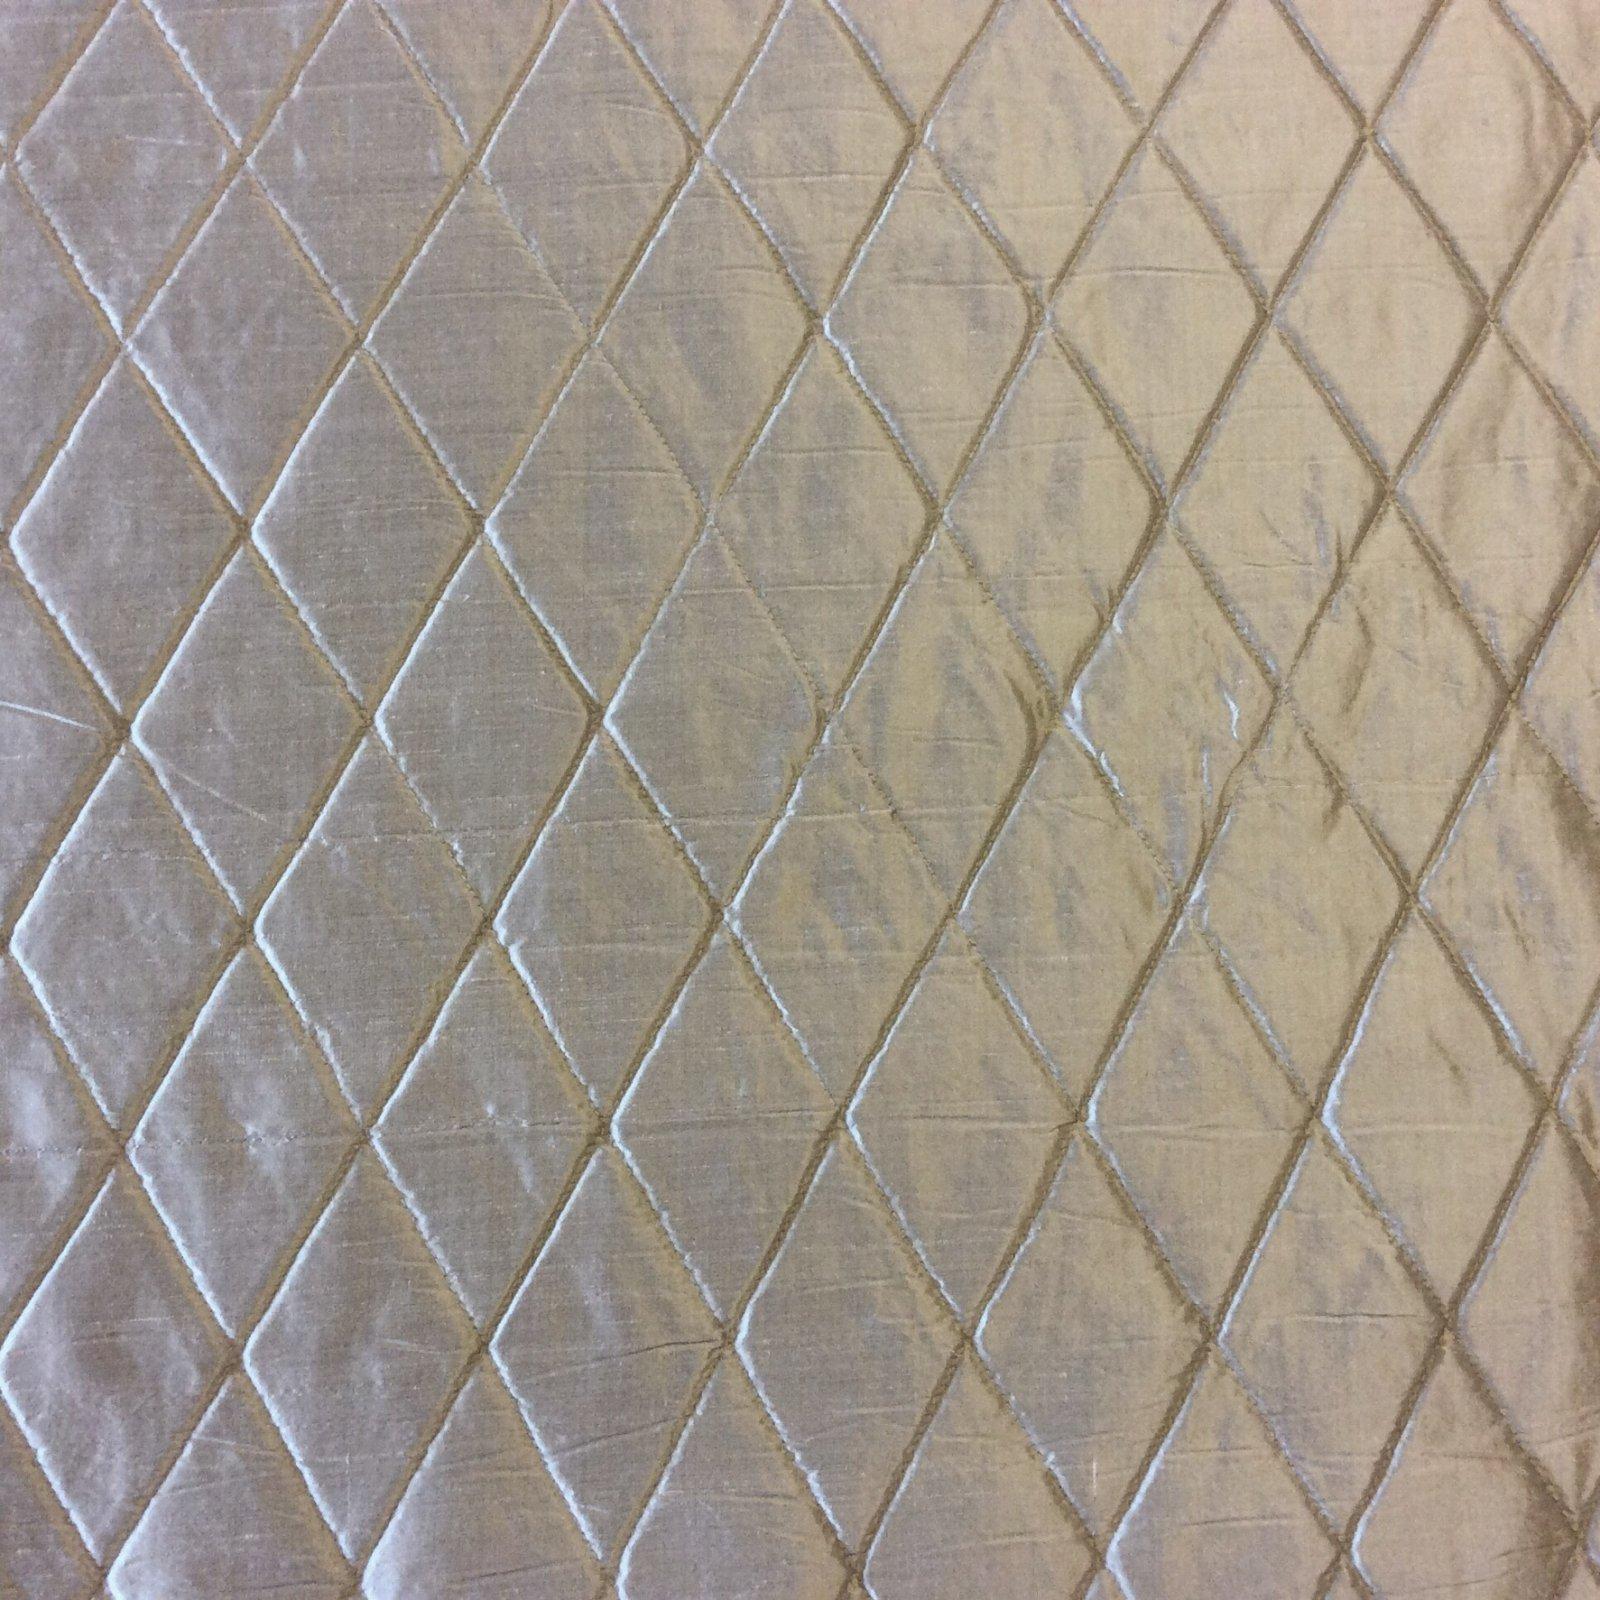 Hd87 Nl261 Platinum Grey Harlequin Quilted Silk Fabric